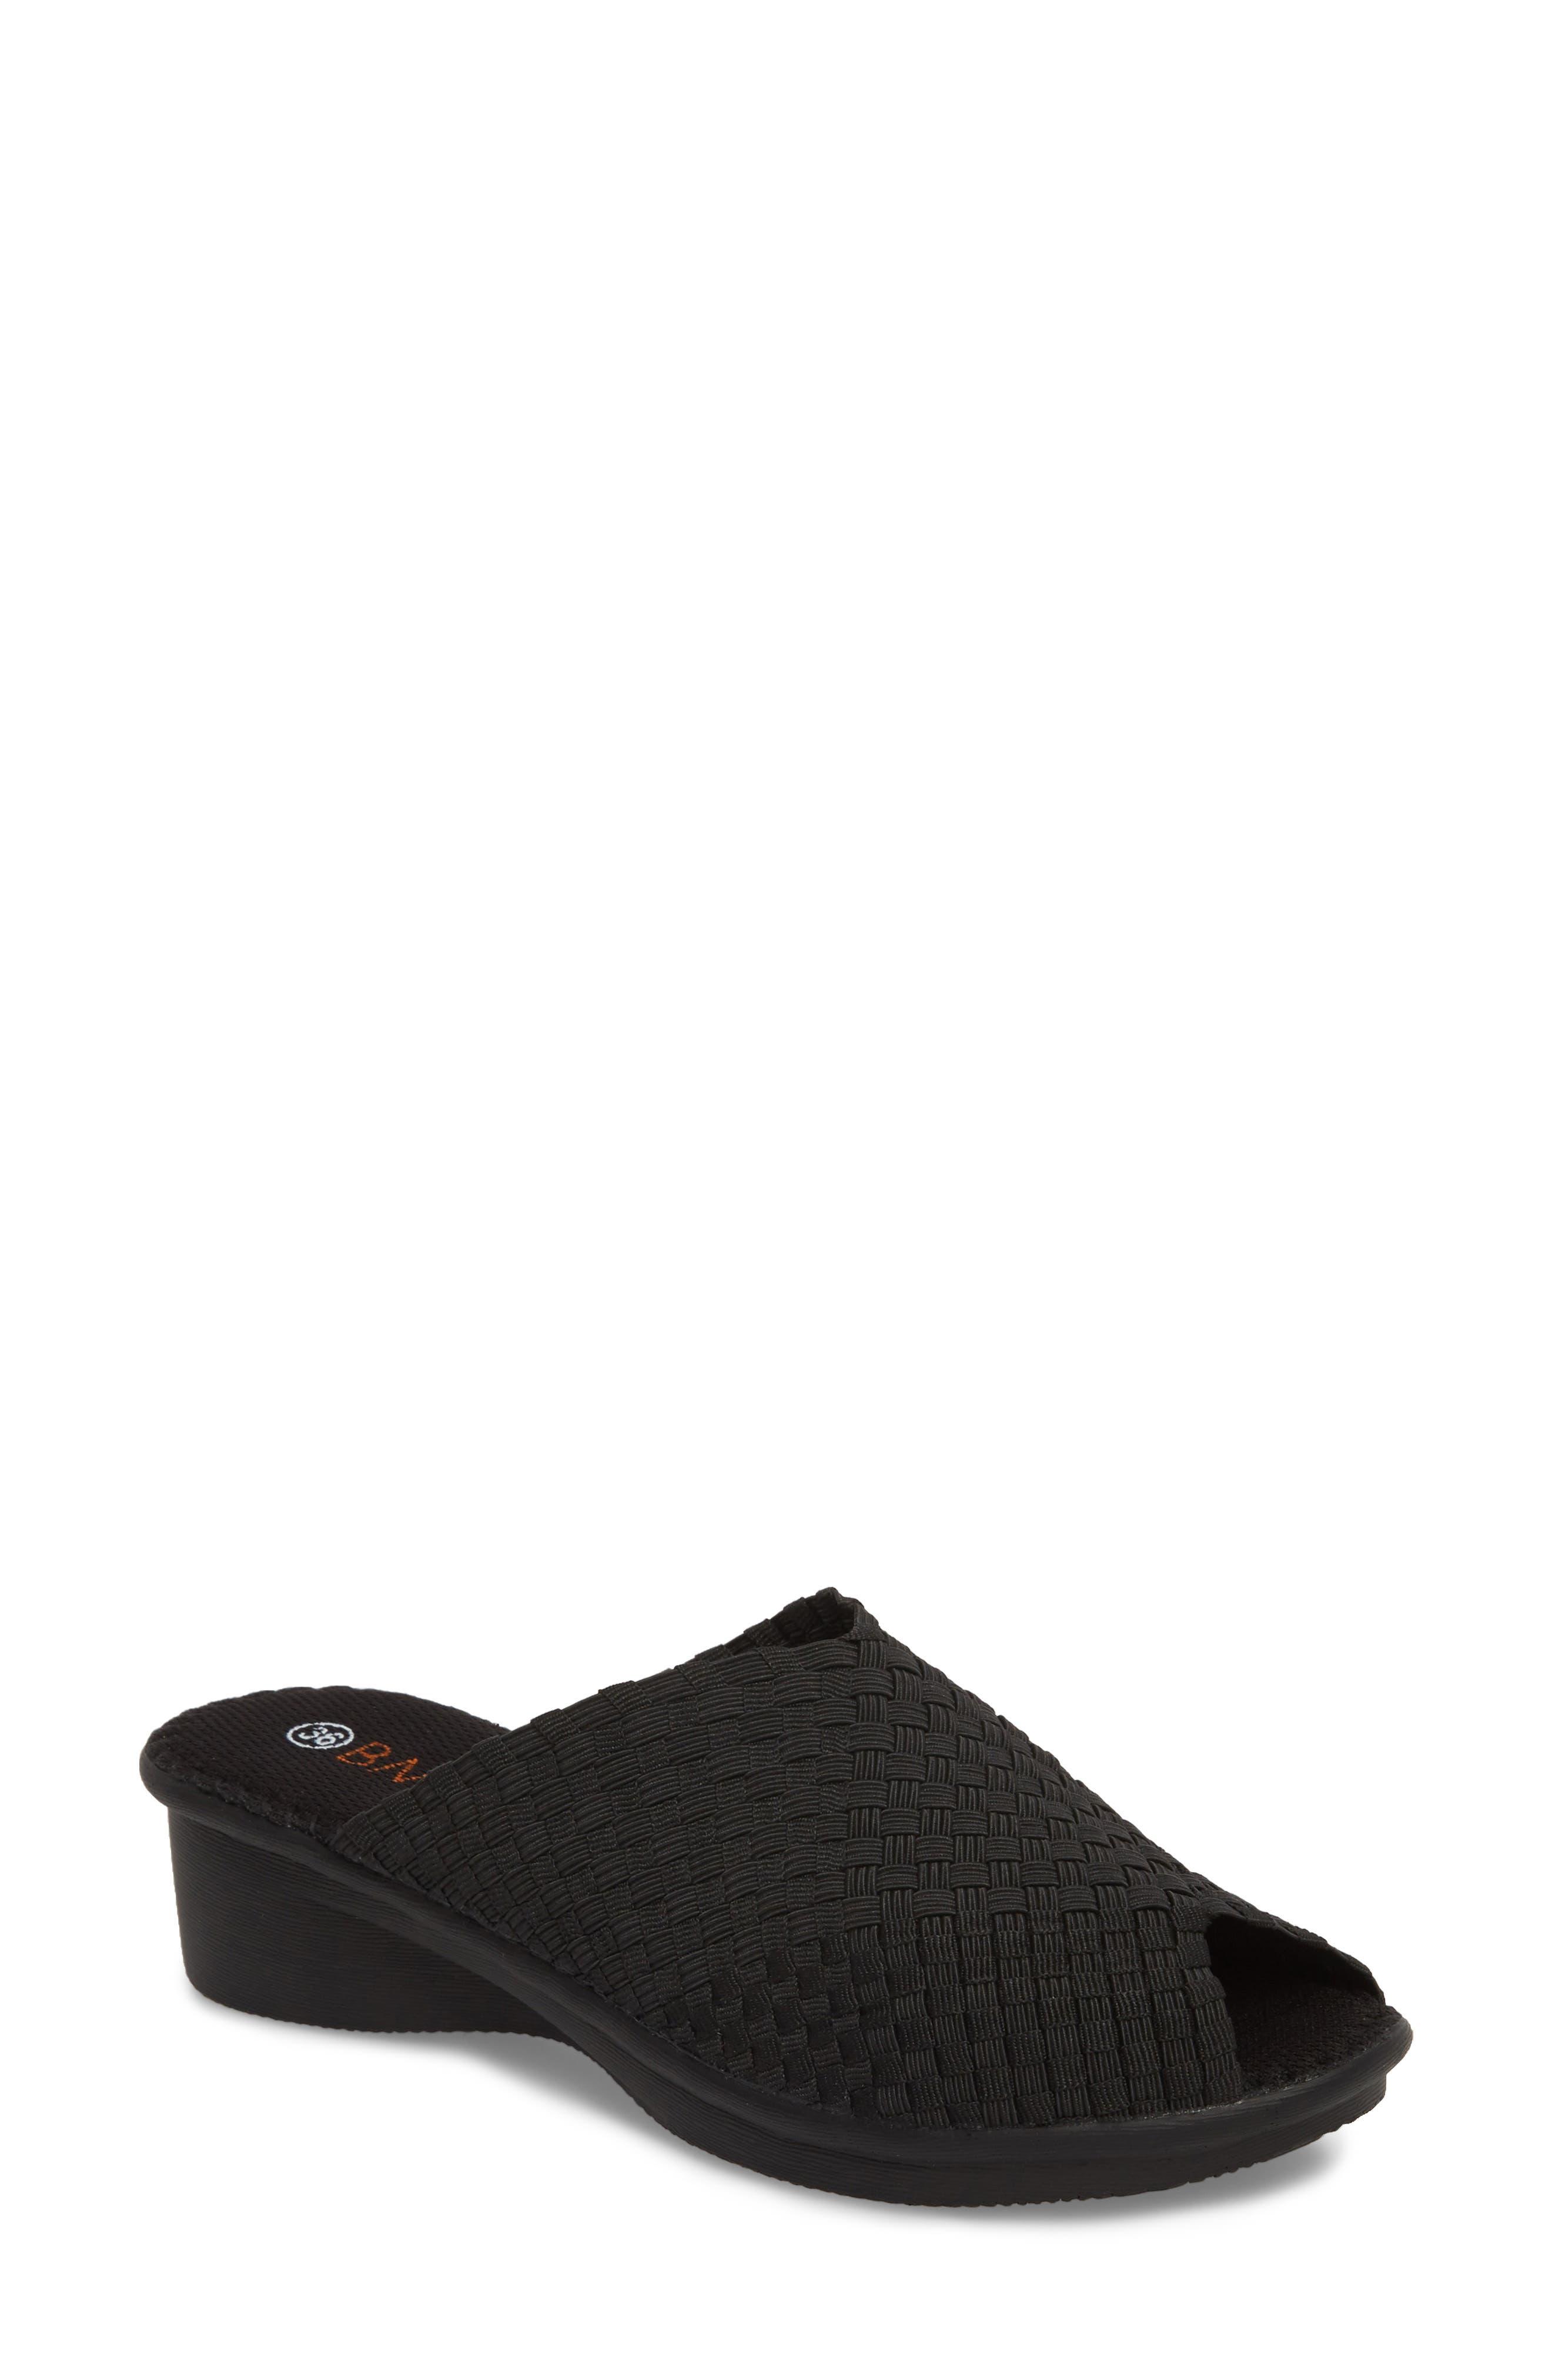 Cyrene Wedge Sandal,                             Main thumbnail 1, color,                             BLACK FABRIC